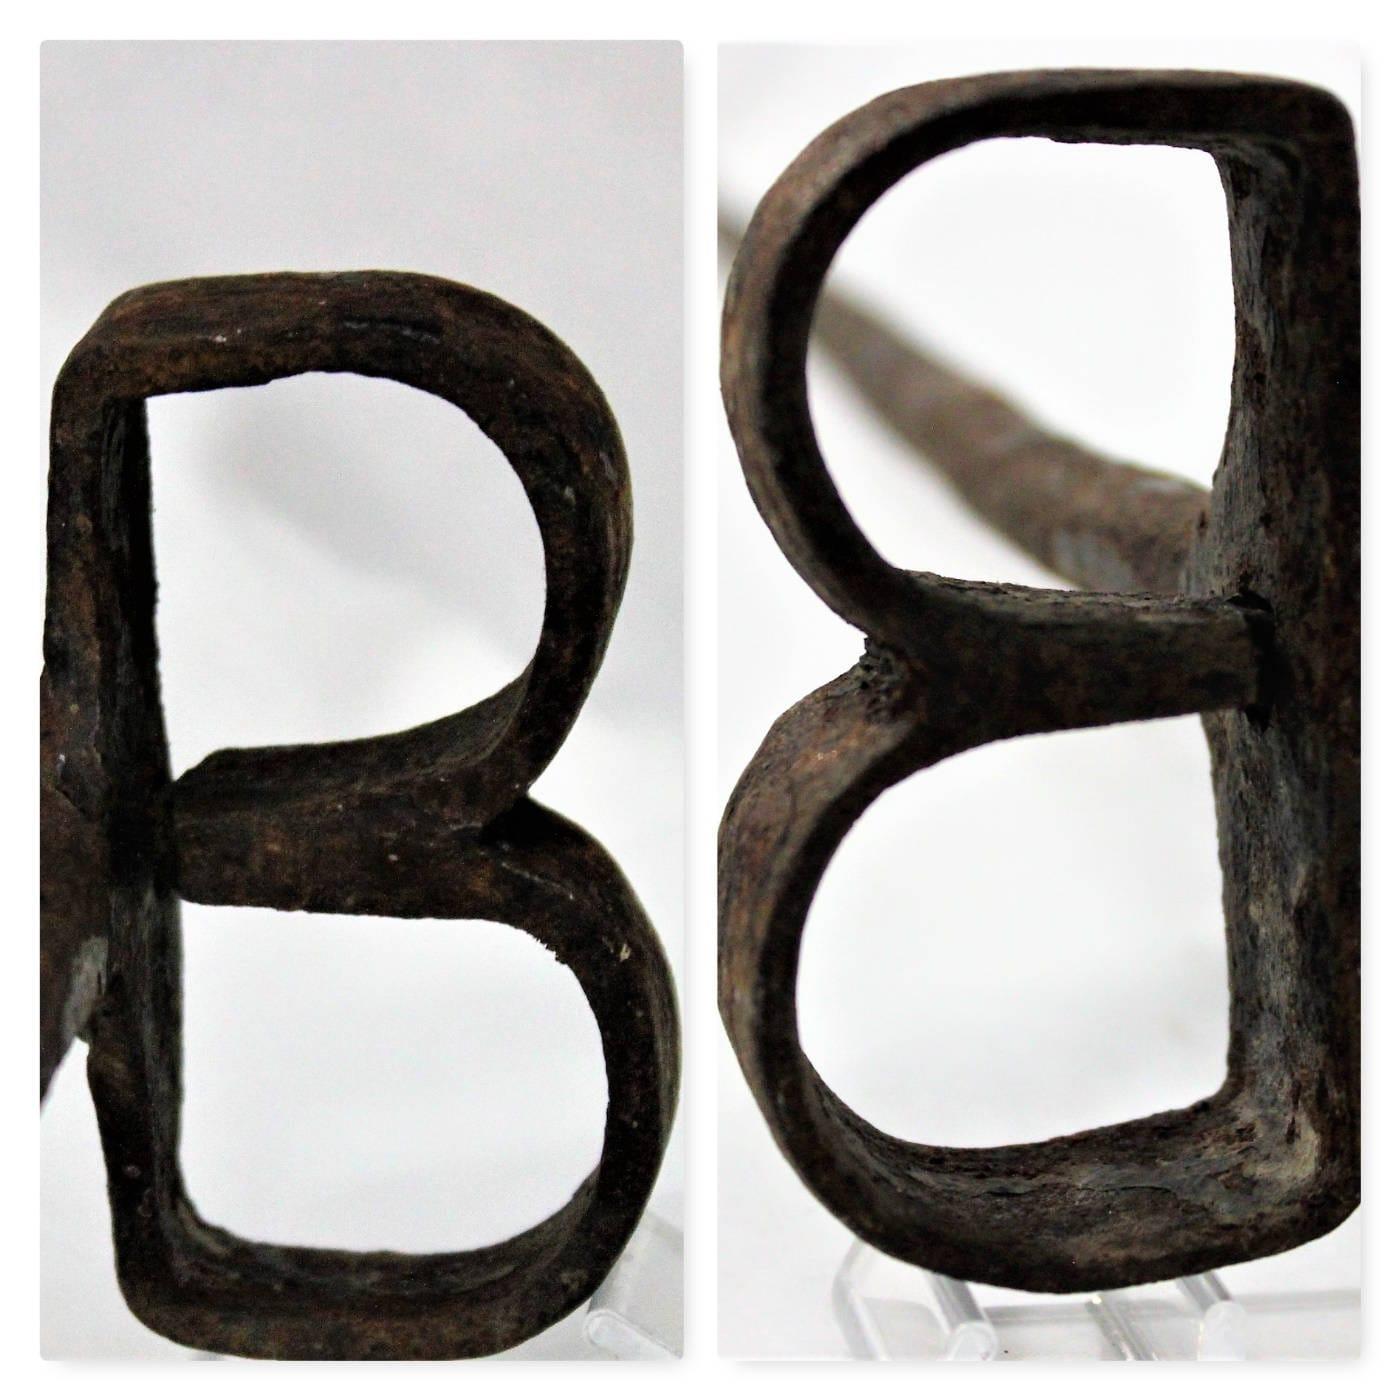 Antique Hand Forged Branding Iron B Brand Branding Iron